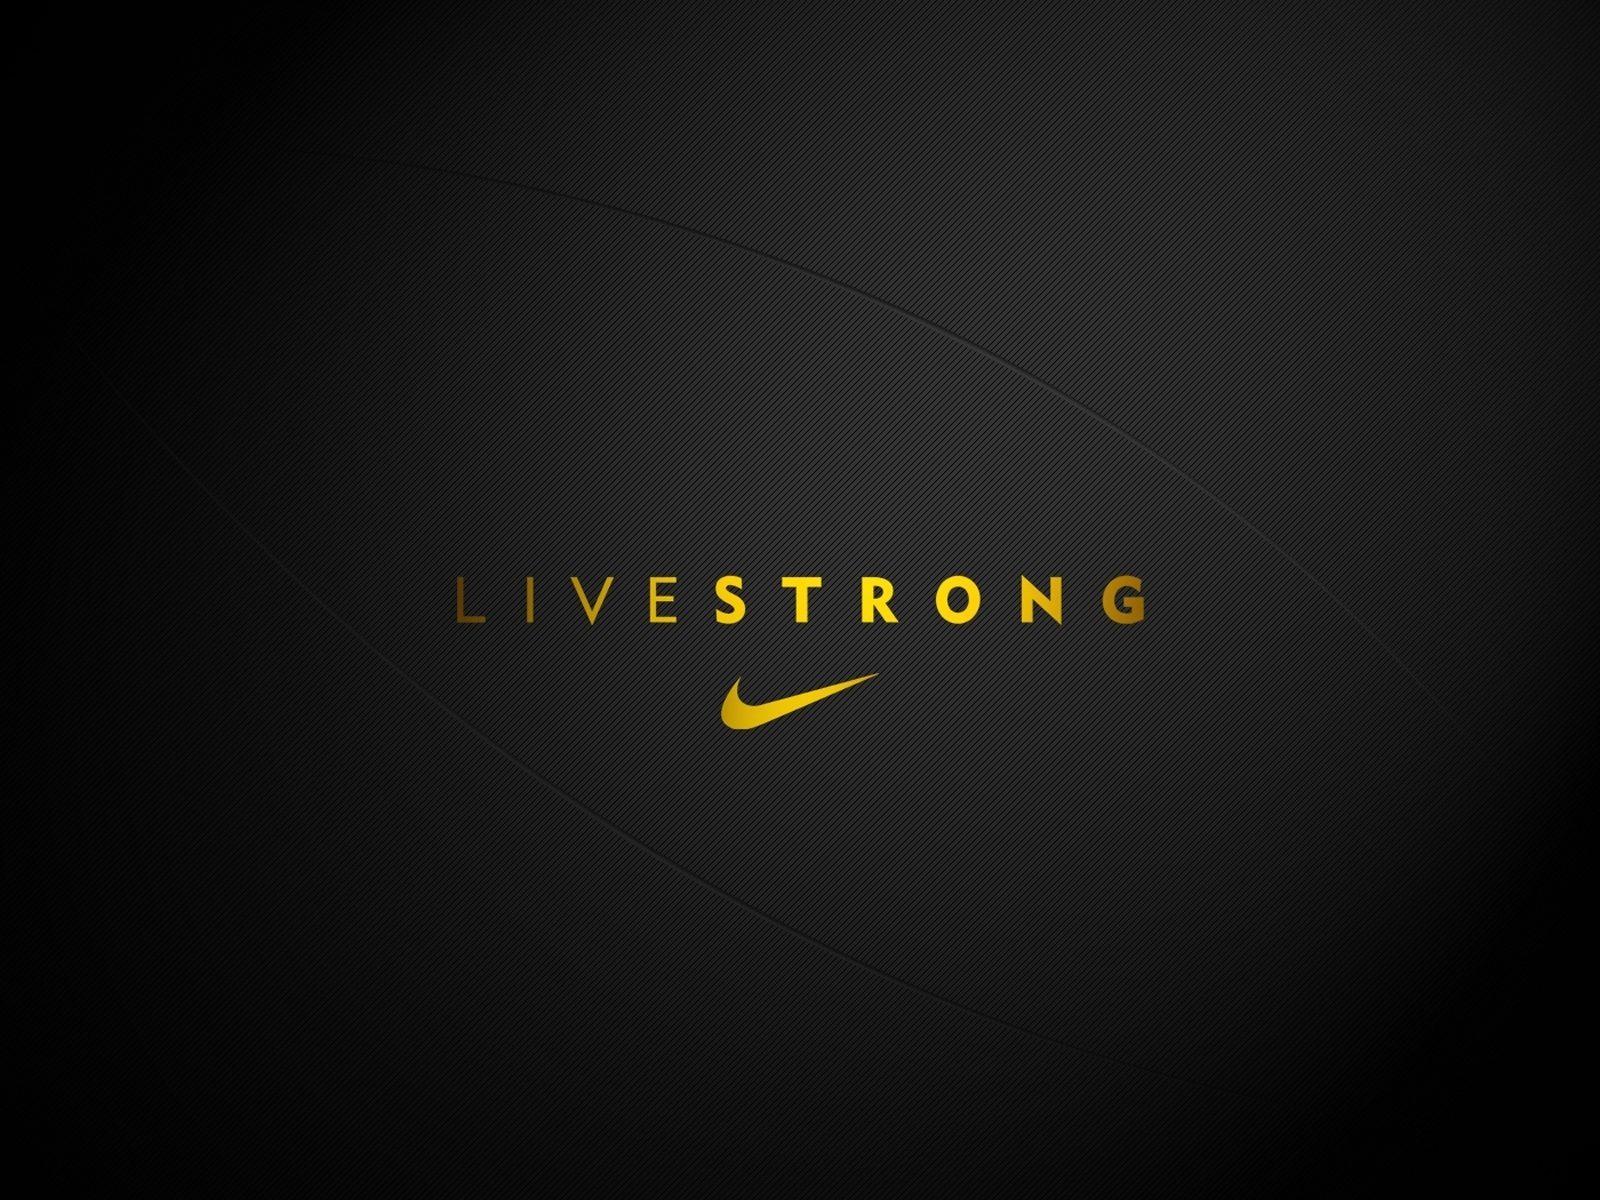 Nike livestrong logo hd wallpaper wallpapers standard voltagebd Images